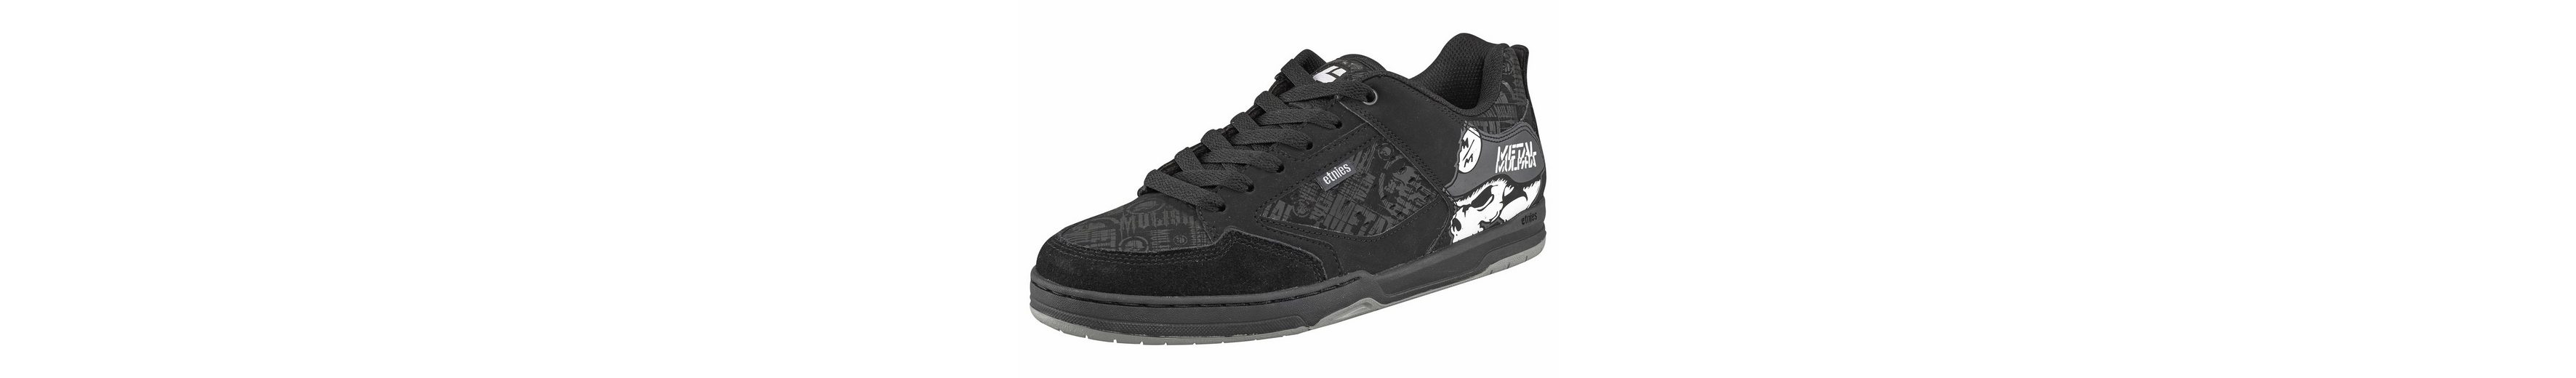 Original-Verkauf Online etnies Metal Mulisha Cartel Sneaker 2018 Neueste 066lcCRso